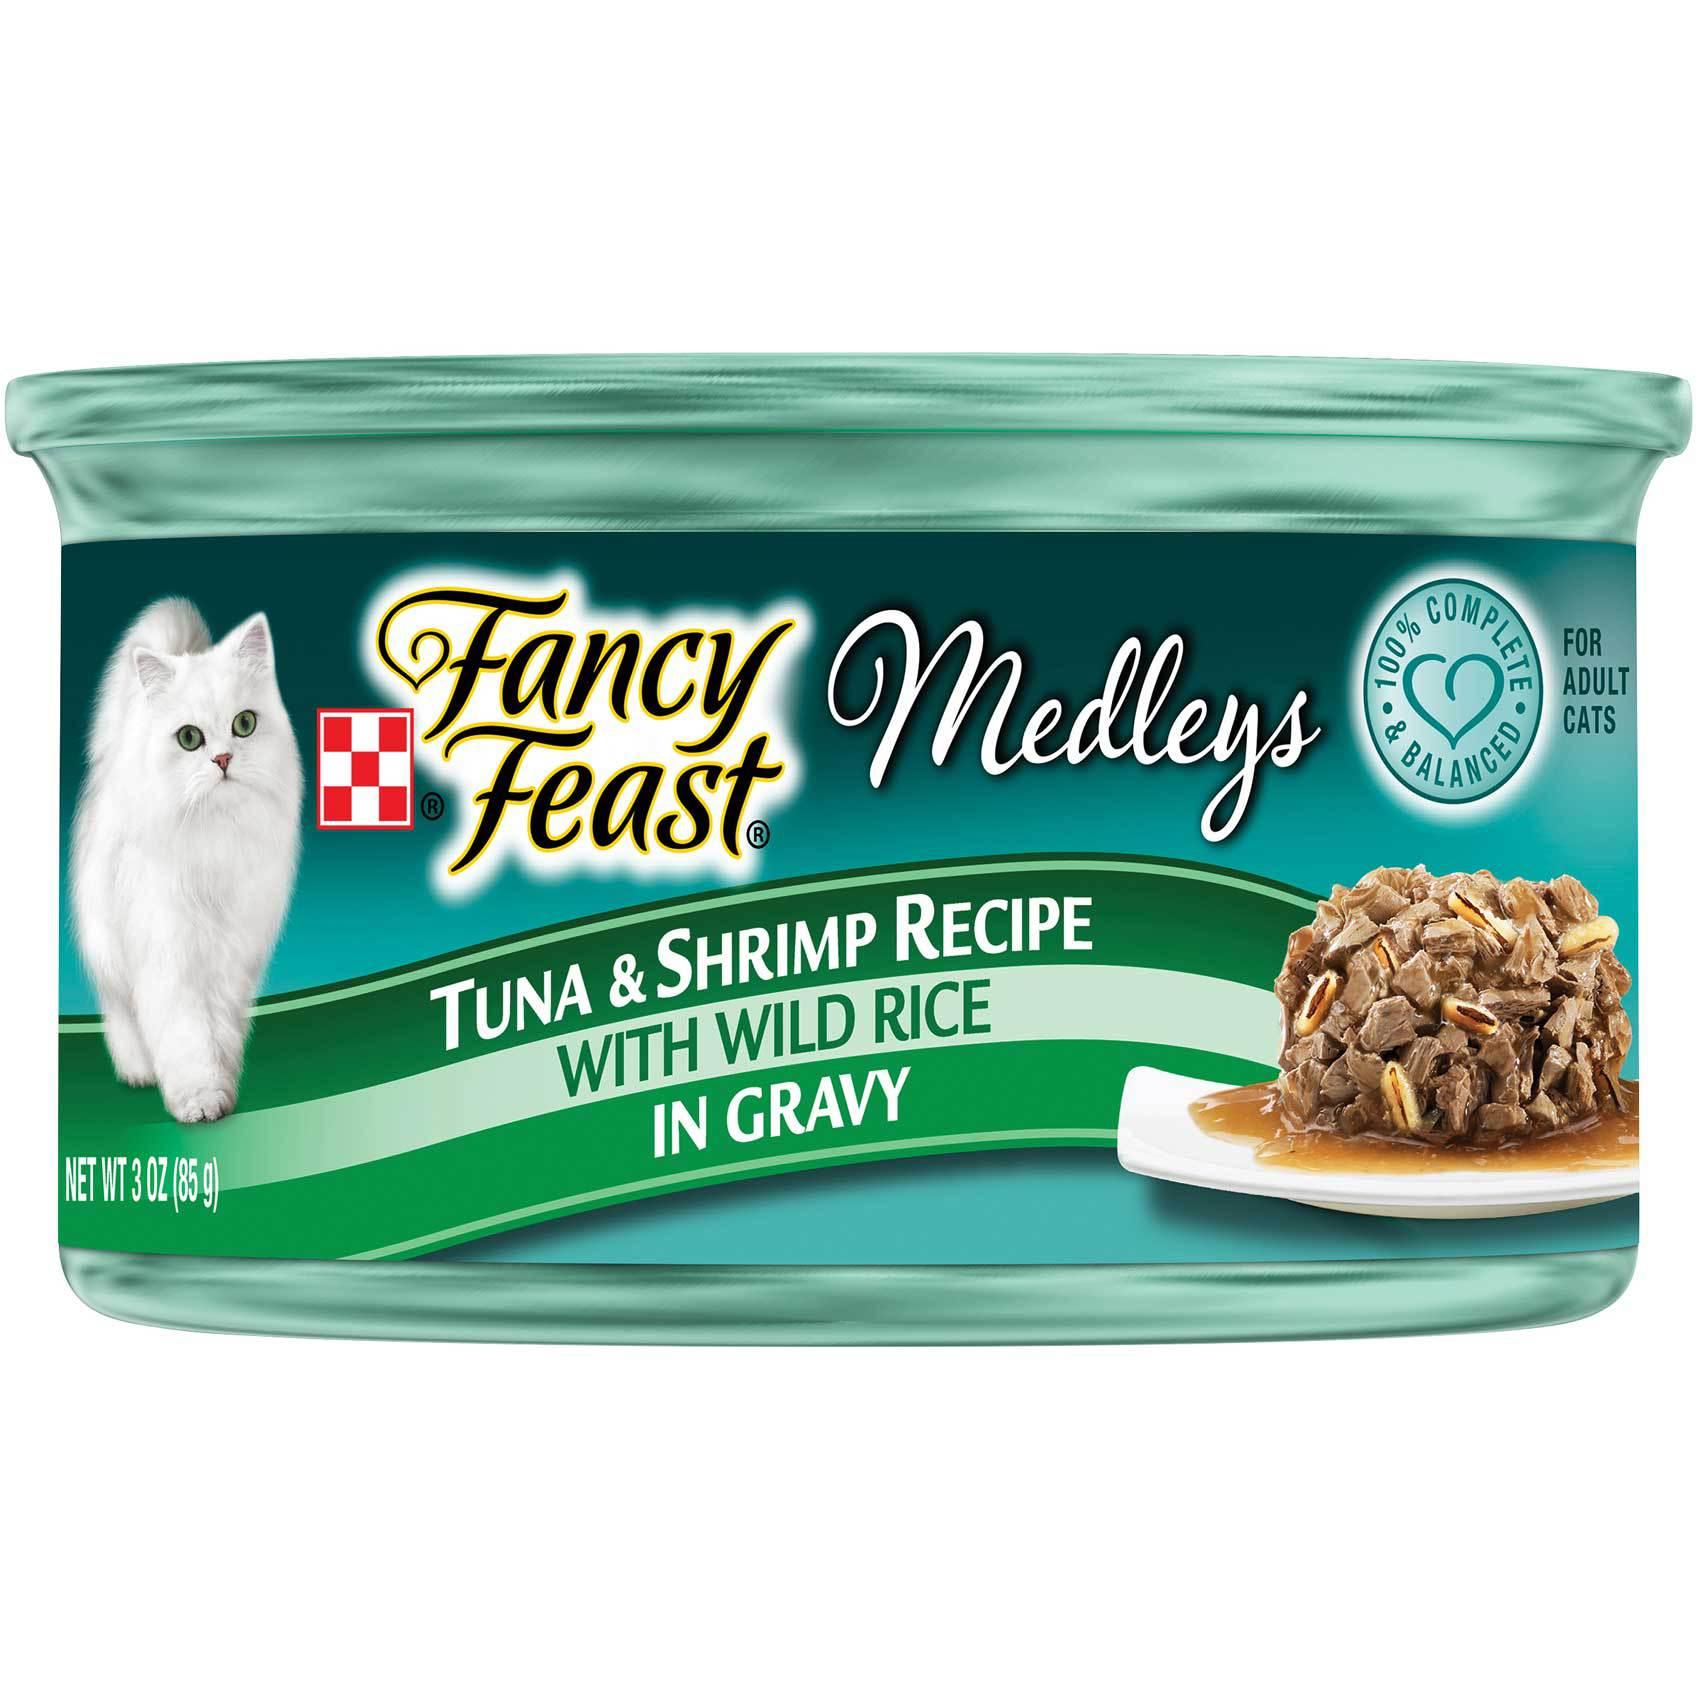 FANCY FEAST MEDLEYS TUNA&SHRIMP85G